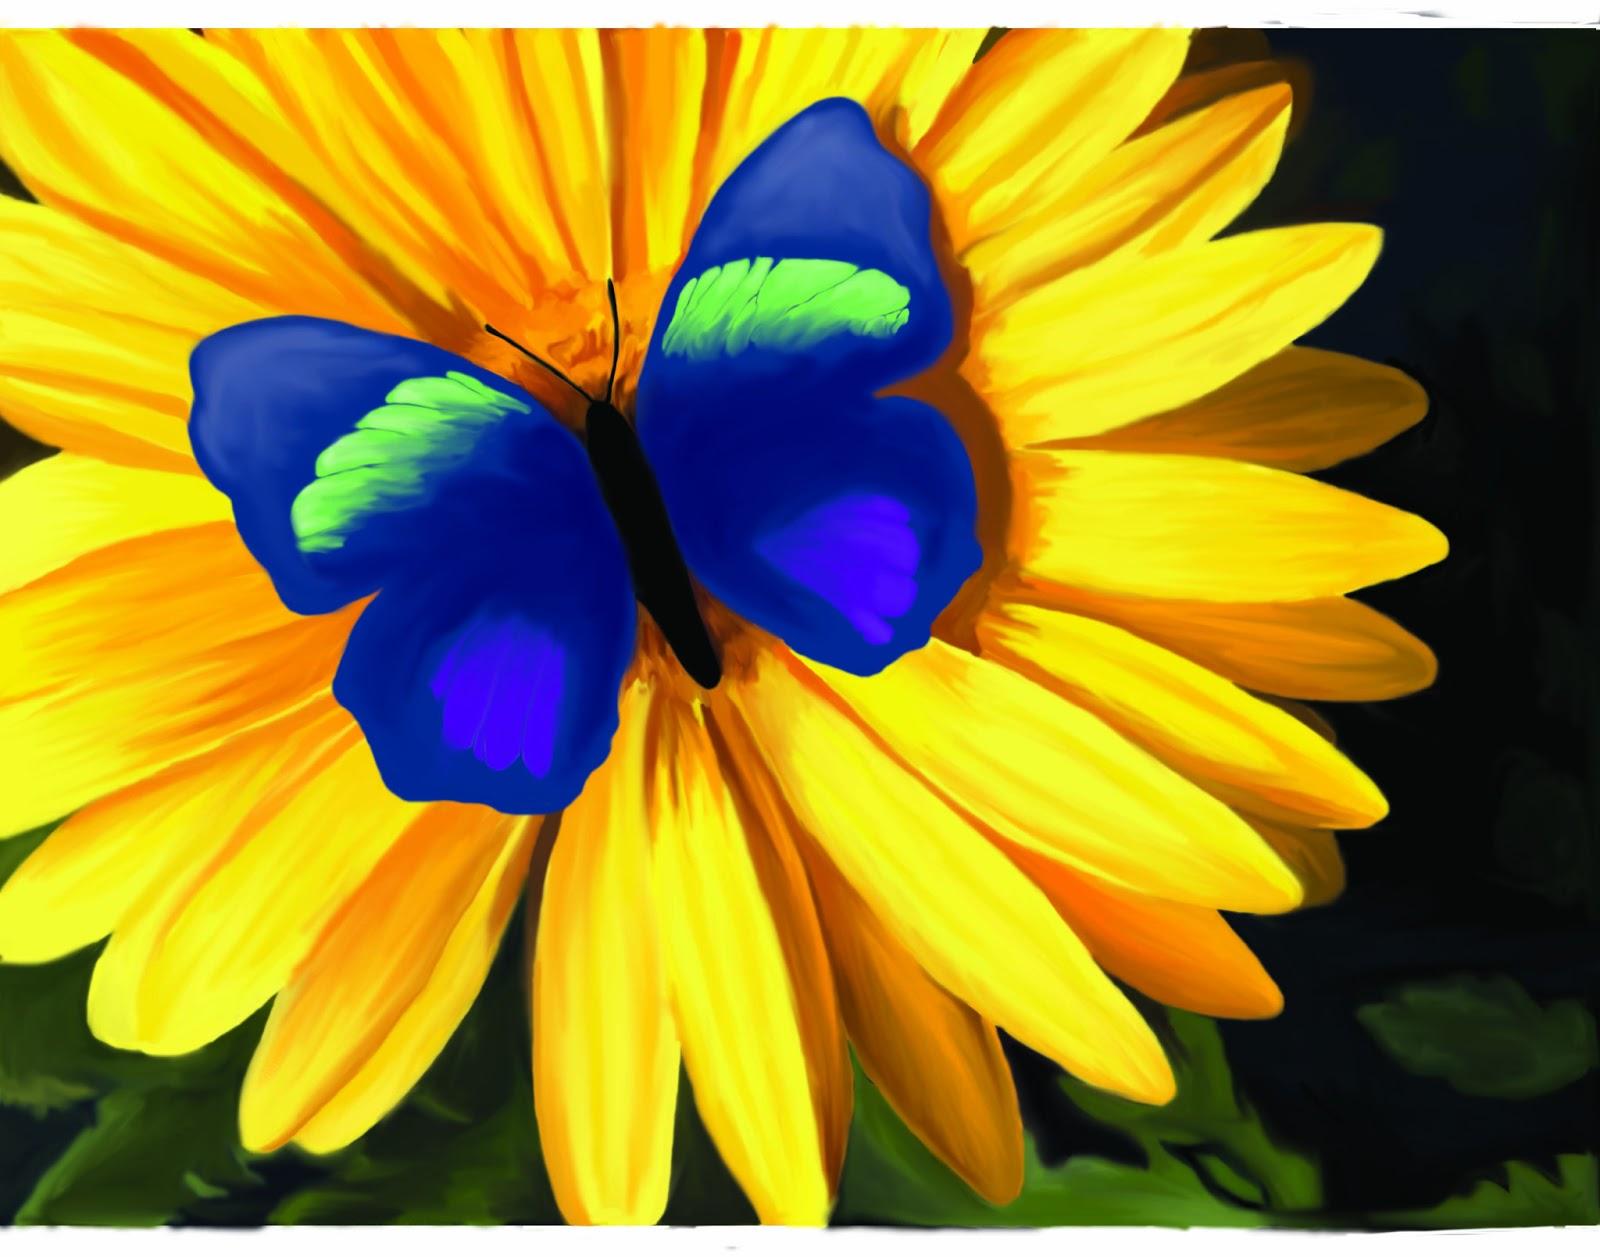 Julia's Creative Imaging Artwork: Butterfly On A Flower